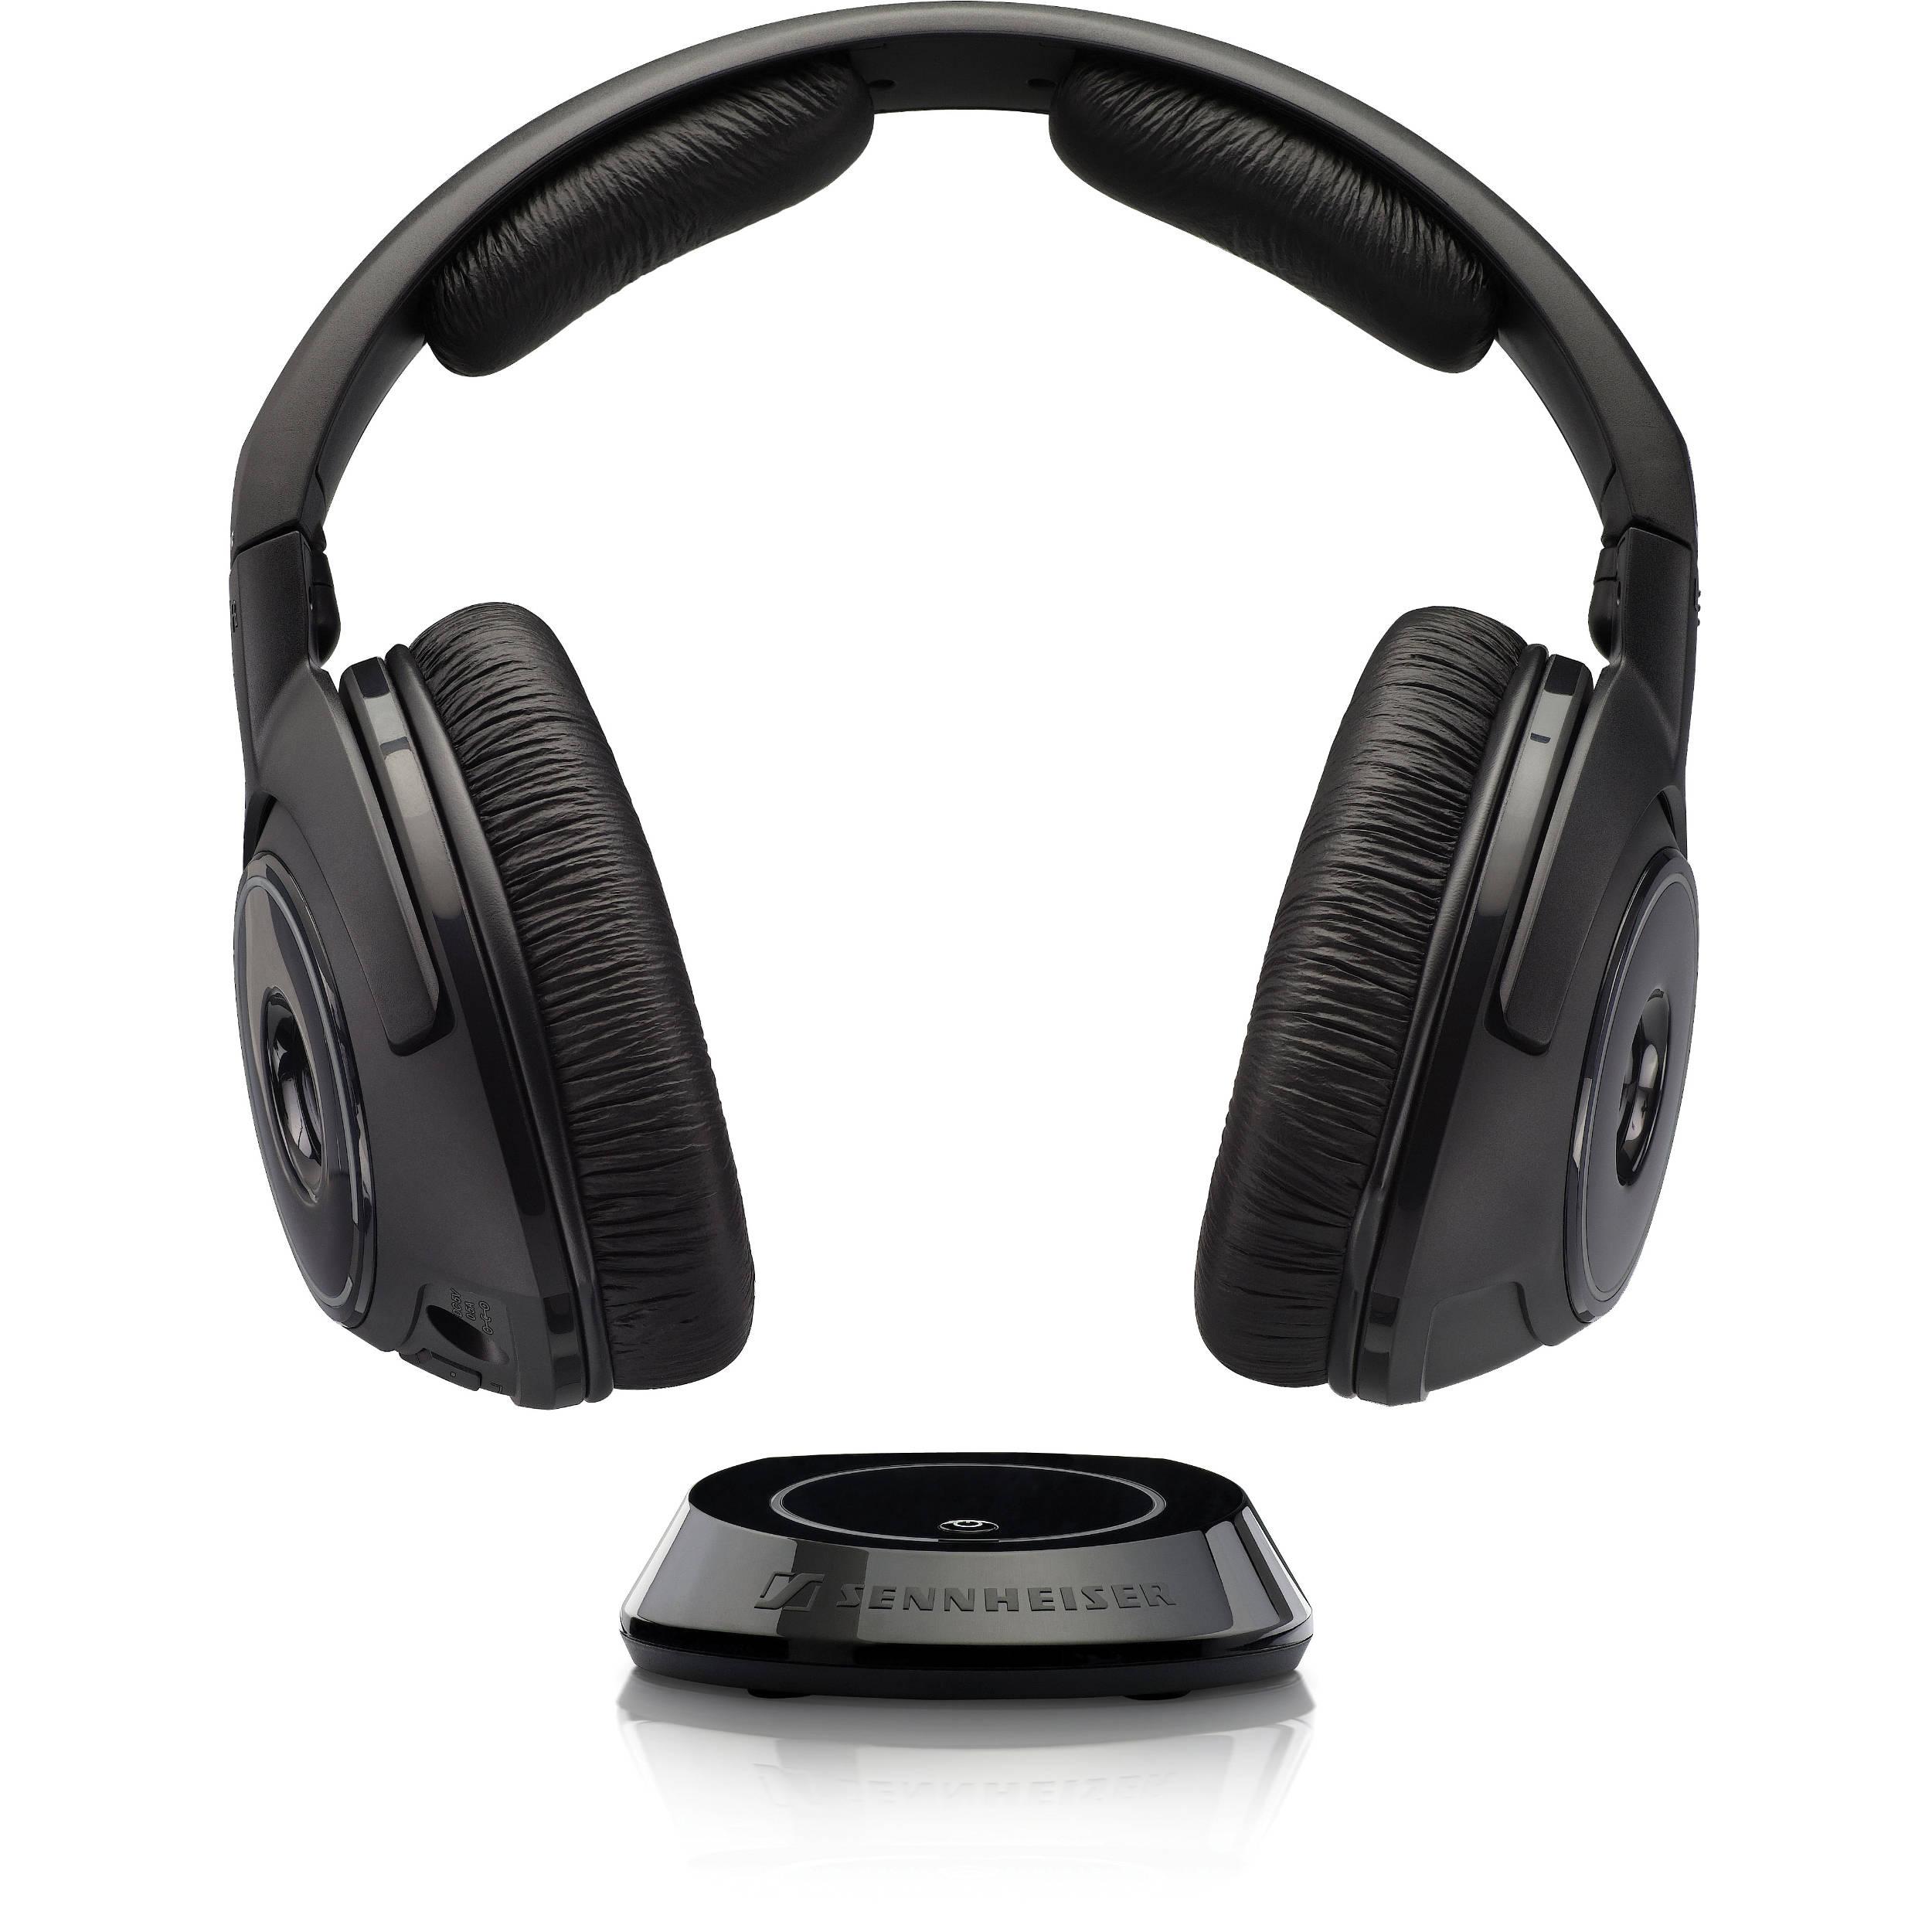 Headphone wireless noise - noise cancelling headphones tv